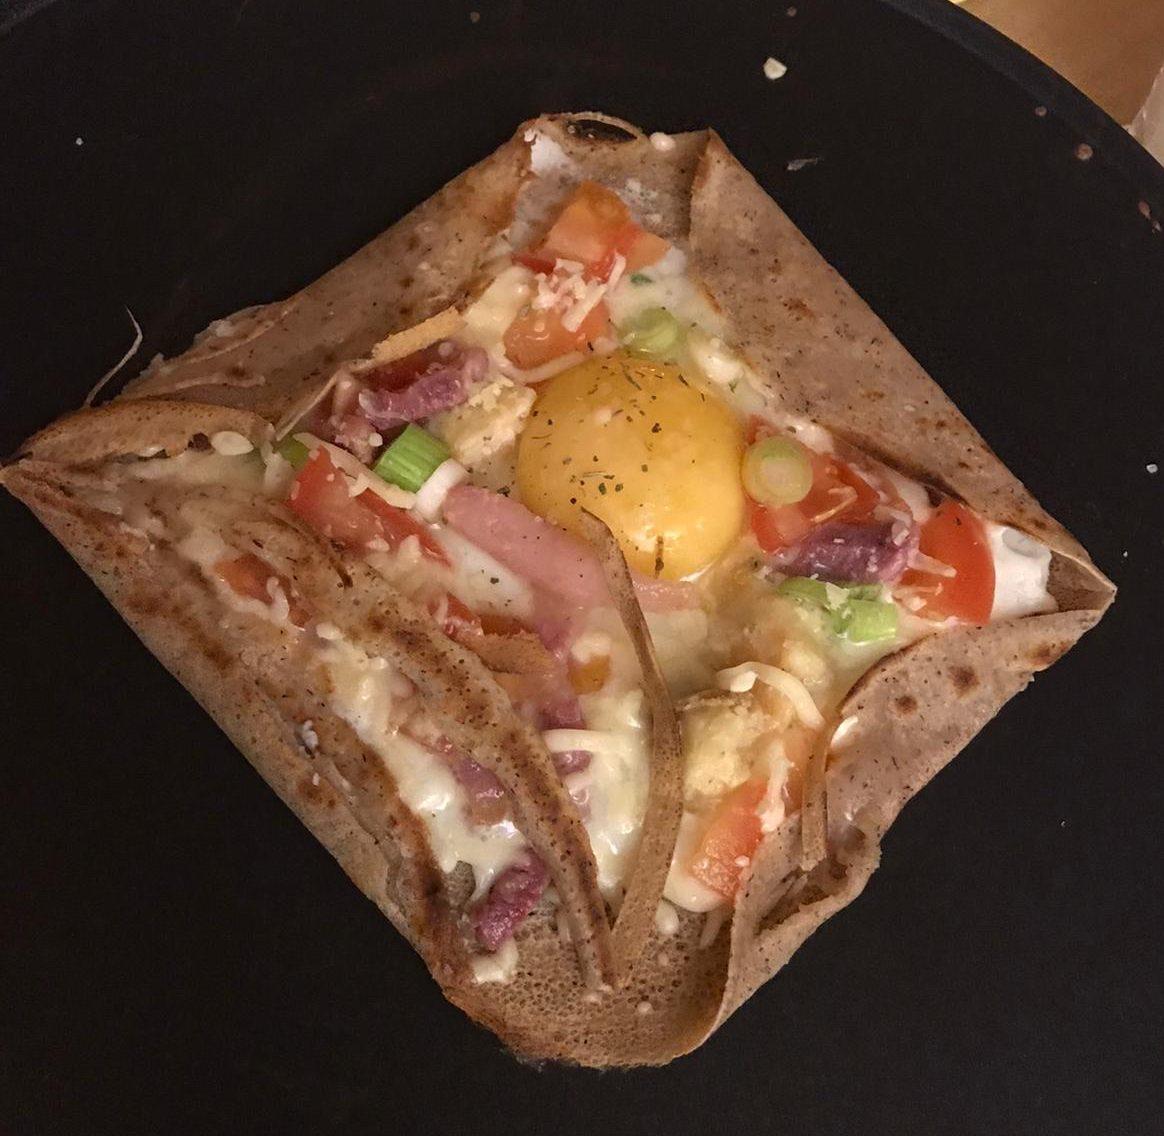 La Bretagne en cuisine - Kochabend Galettes & Crêpes